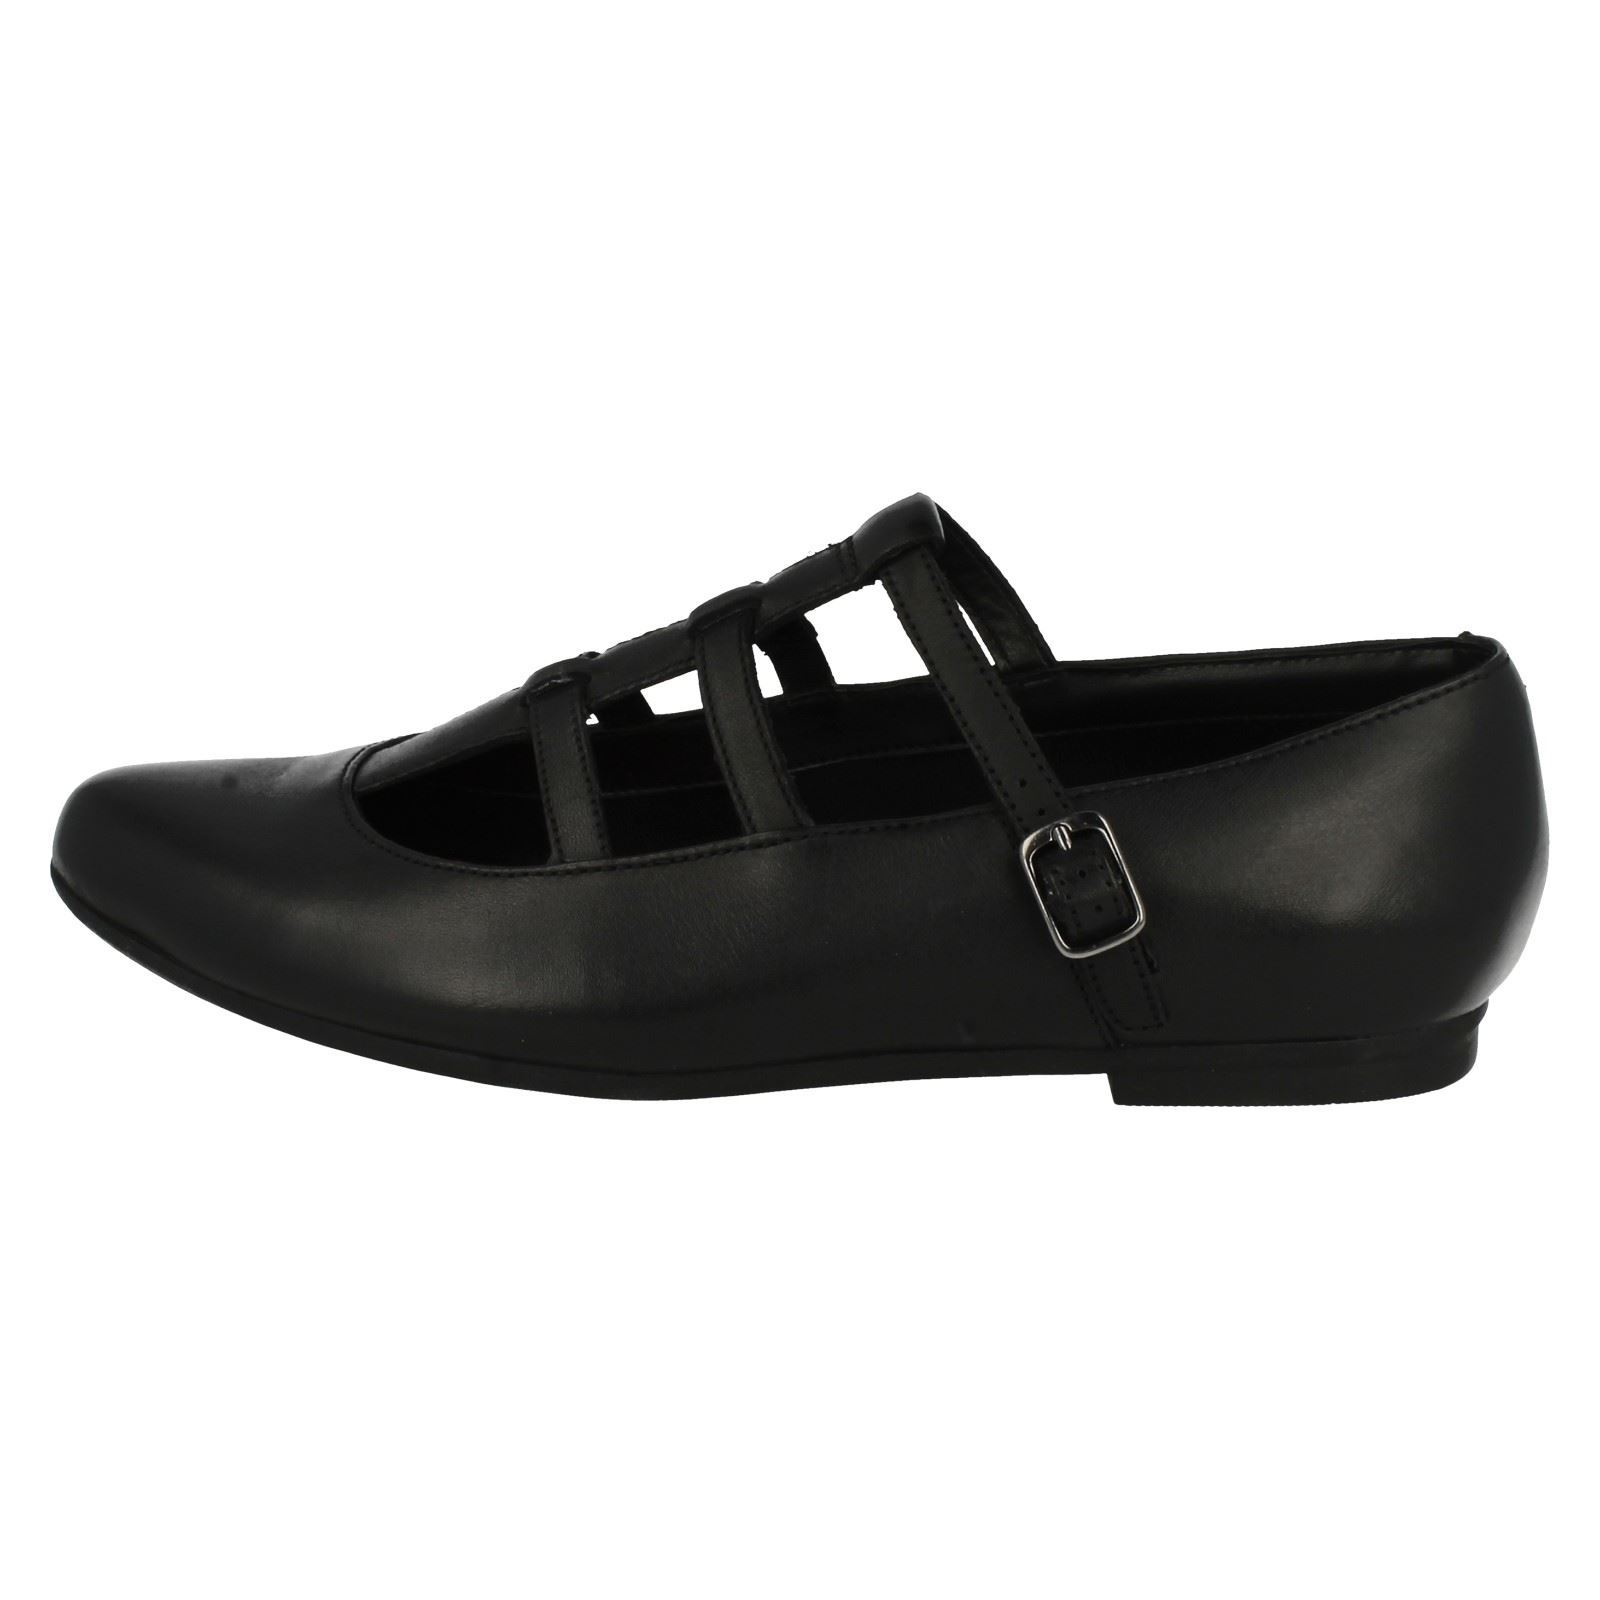 Senior Girls Bootleg by Clarks School Shoes *QuartzFlash BL*